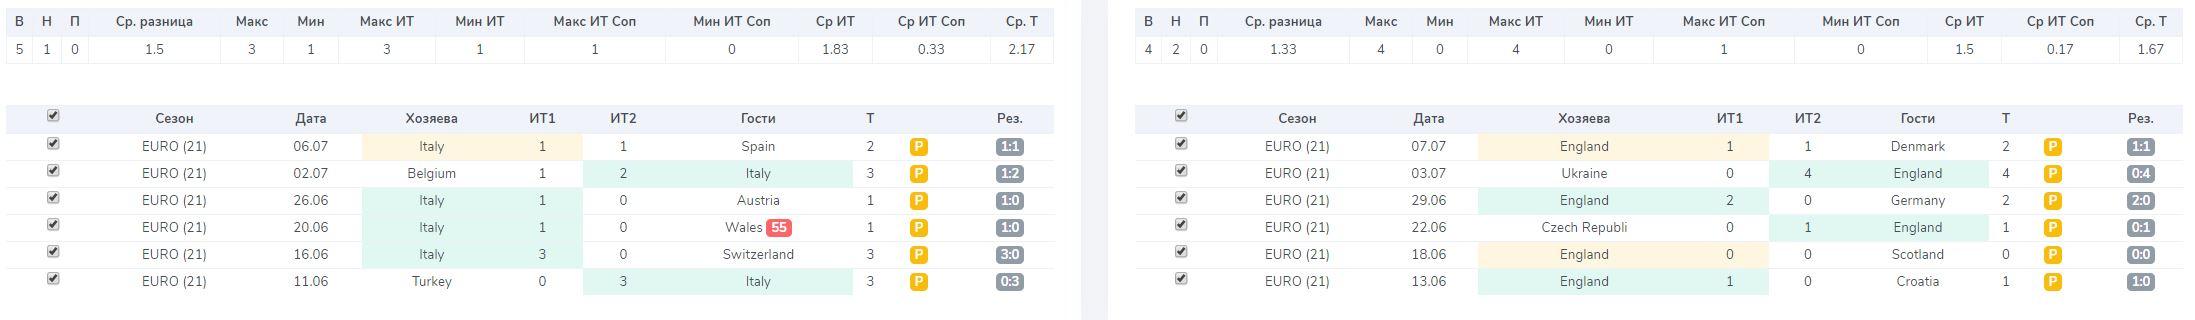 Все матчи команд на турнире Евро